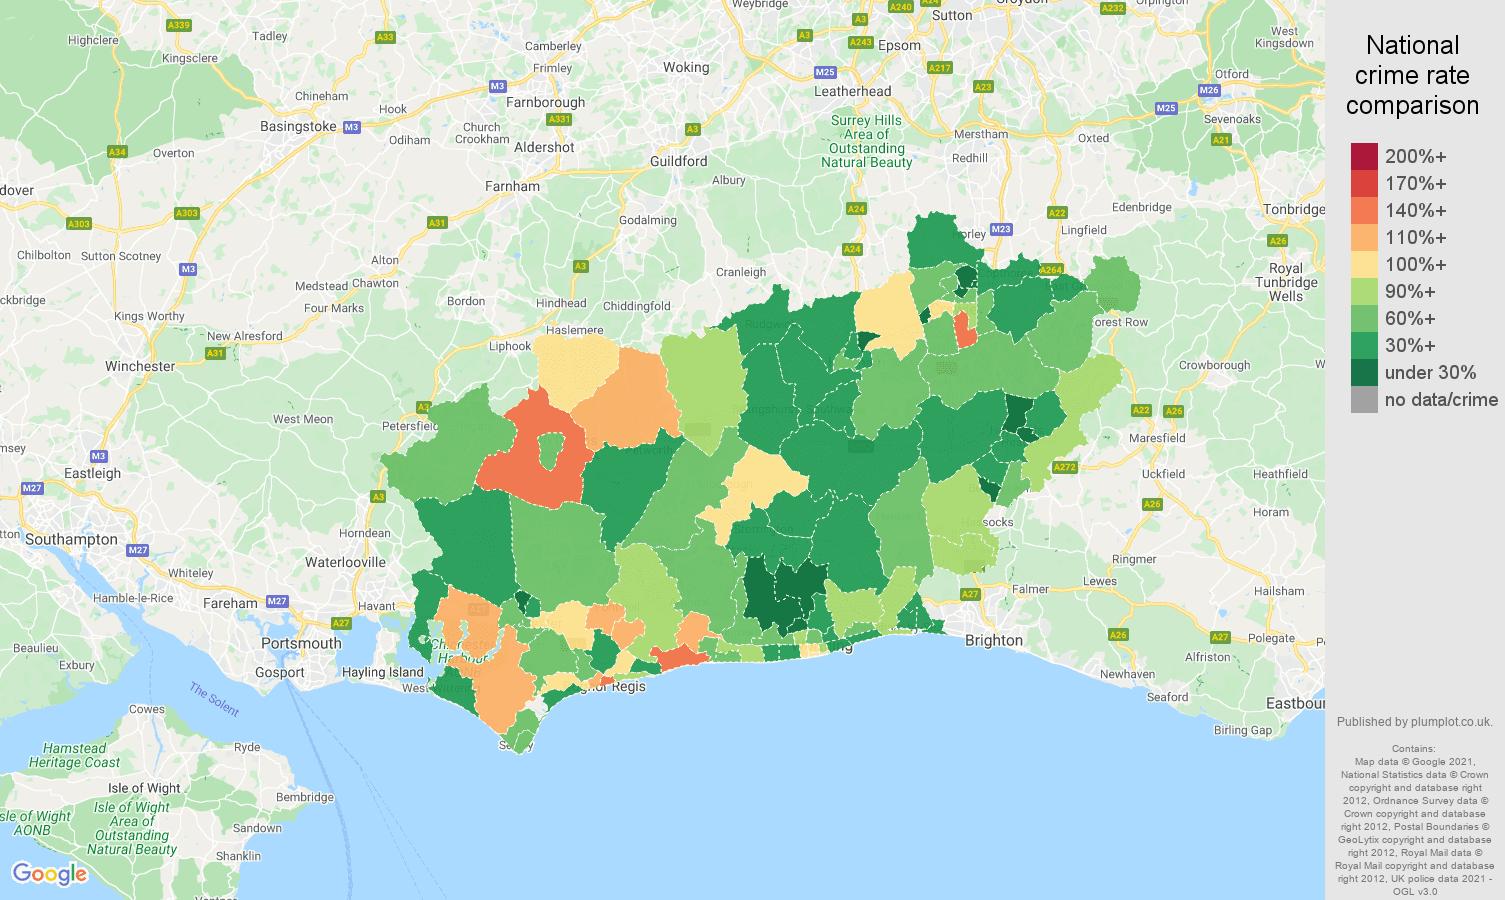 West Sussex burglary crime rate comparison map